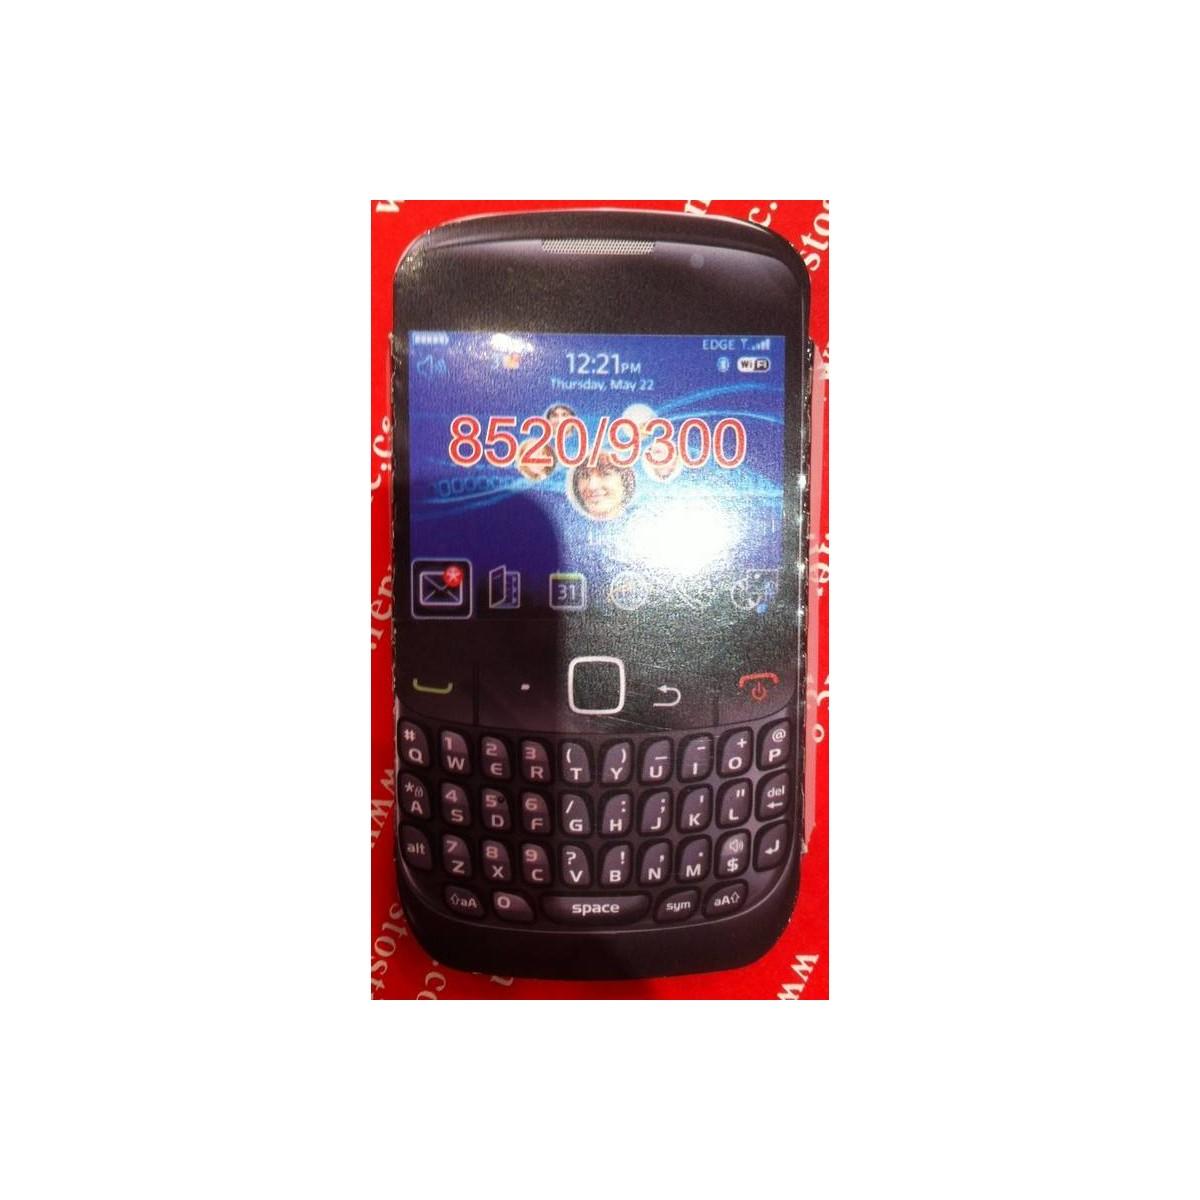 Funda Silicona BlackBerry 8520/9300 AZUL